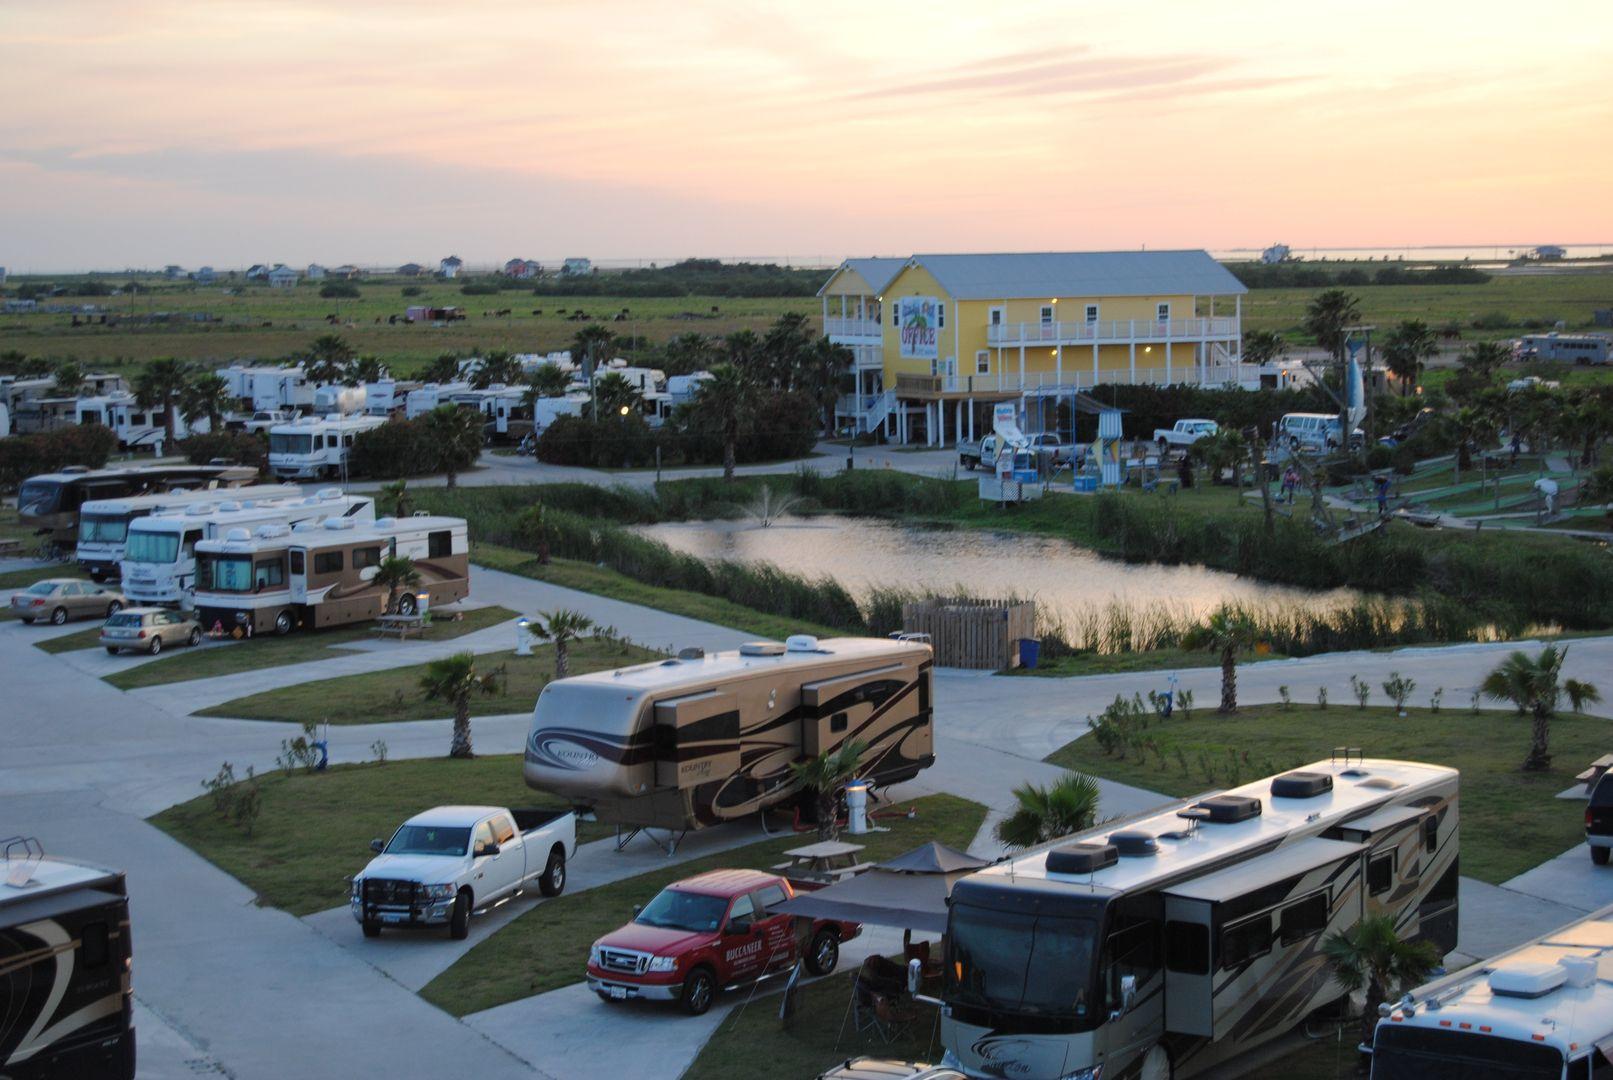 Jamaica Beach Rv Resort Rv Parks Campground Rv Park Reviews Jamaica Beaches Resort Rv Parks